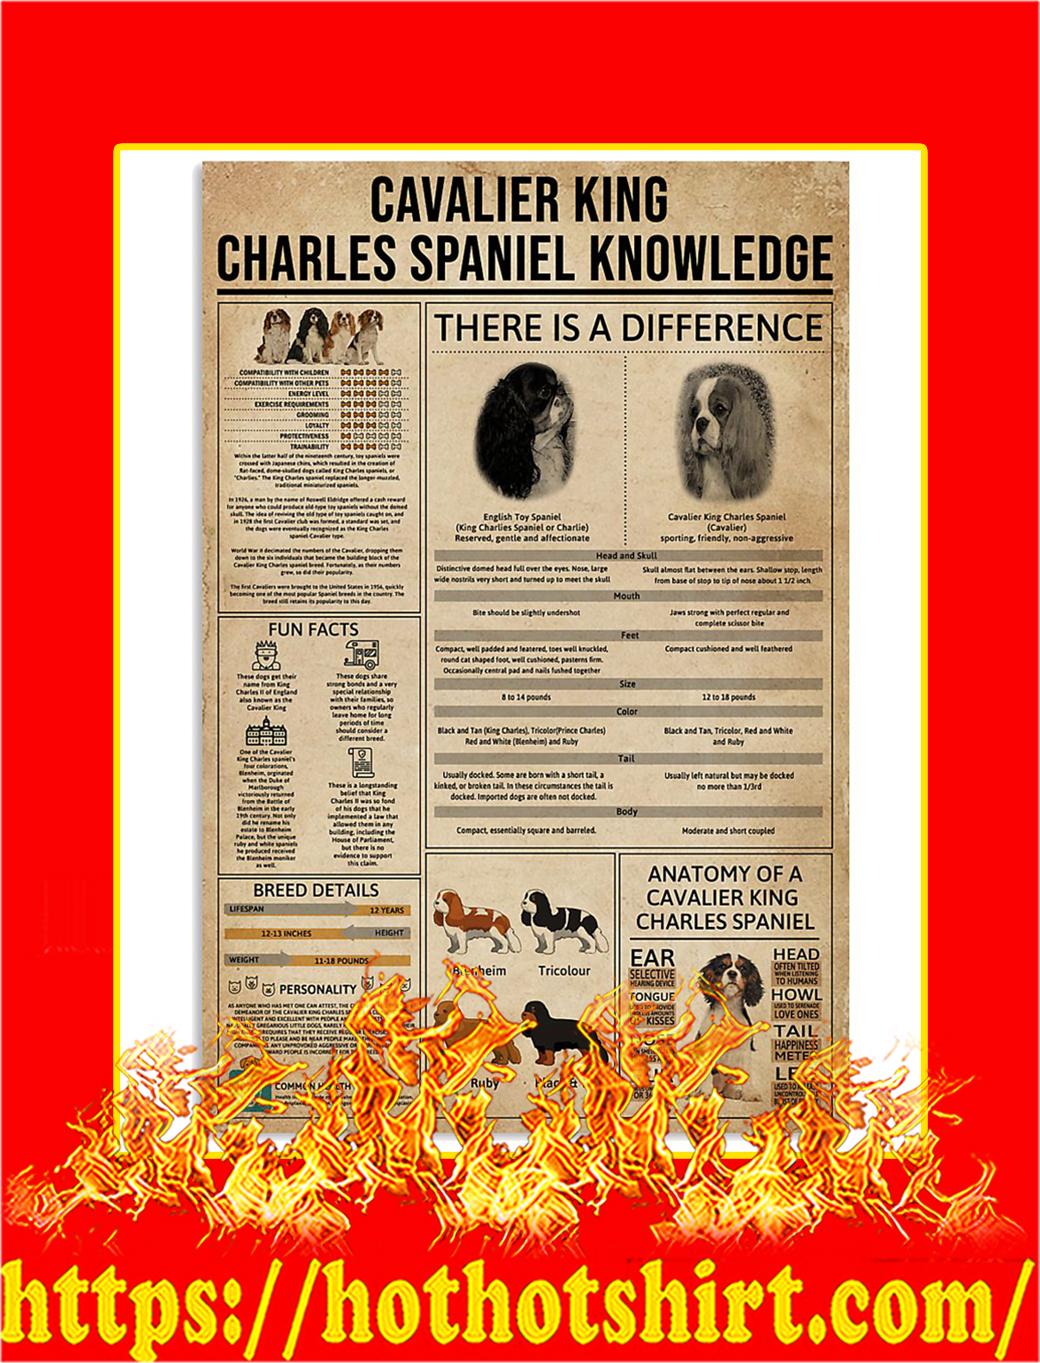 Cavalier King Charles Spaniel Knowledge Poster